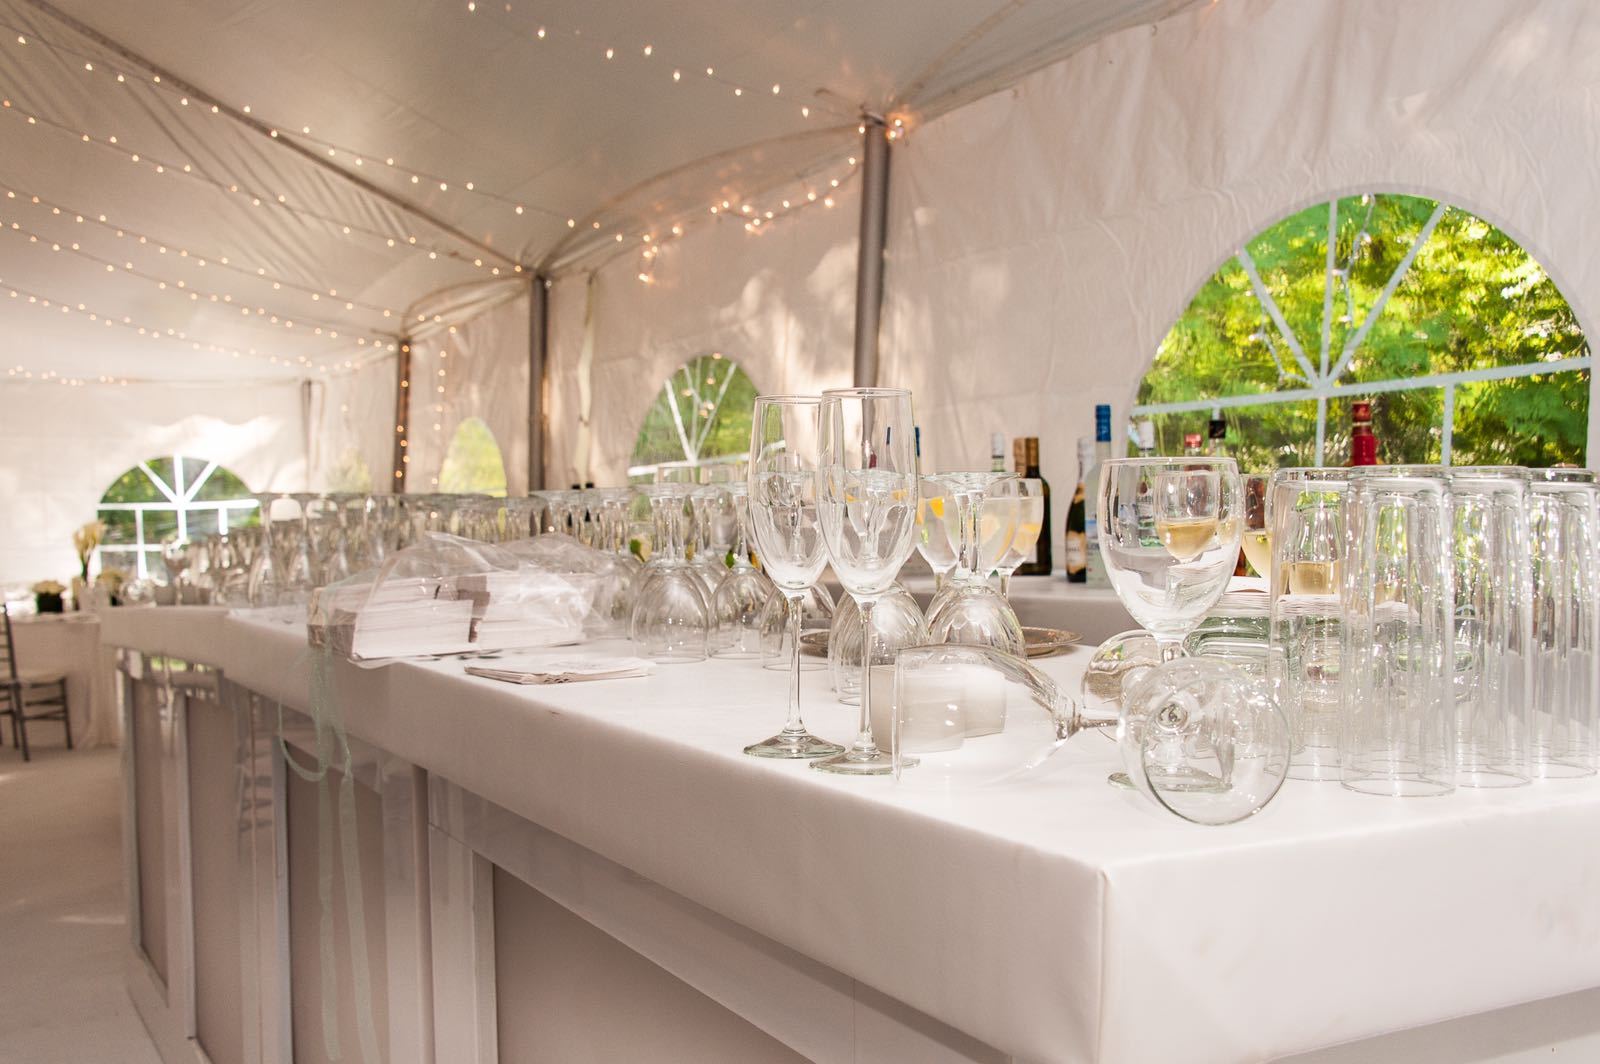 Wedding Bar Glasses, So Many Choices!